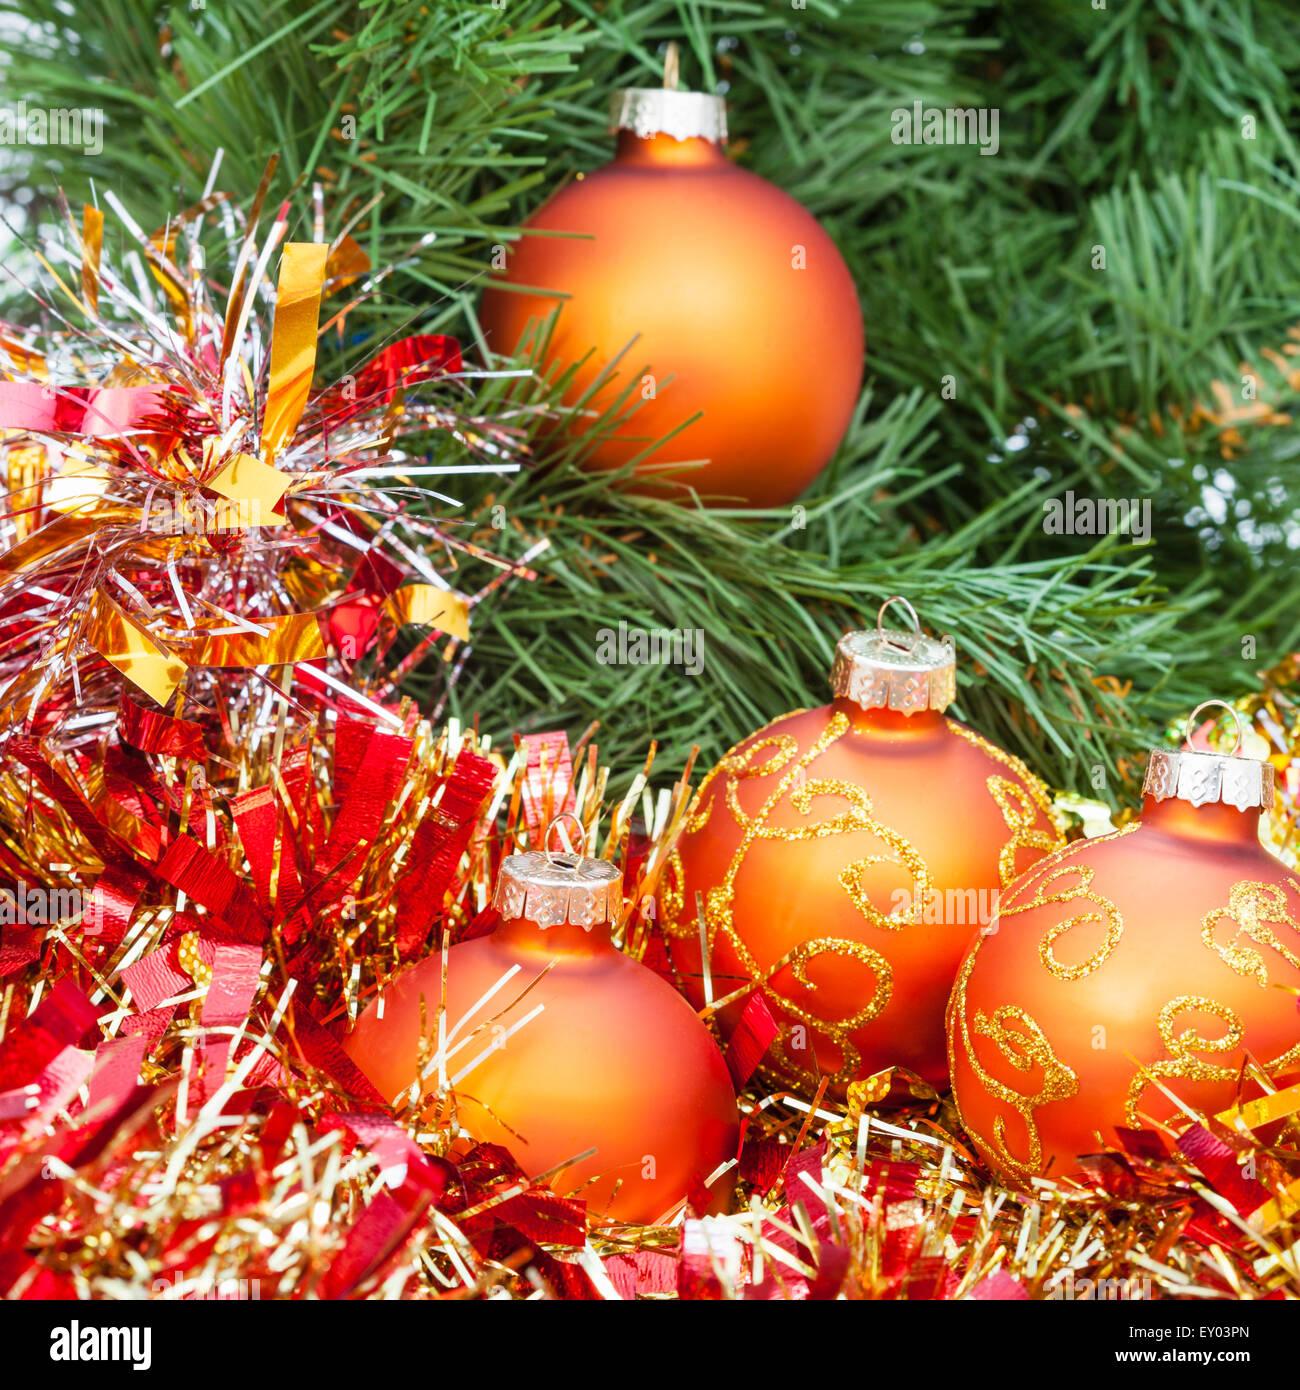 Christmas Still Life Four Orange And Yellow Christmas Balls Red Stock Photo Alamy